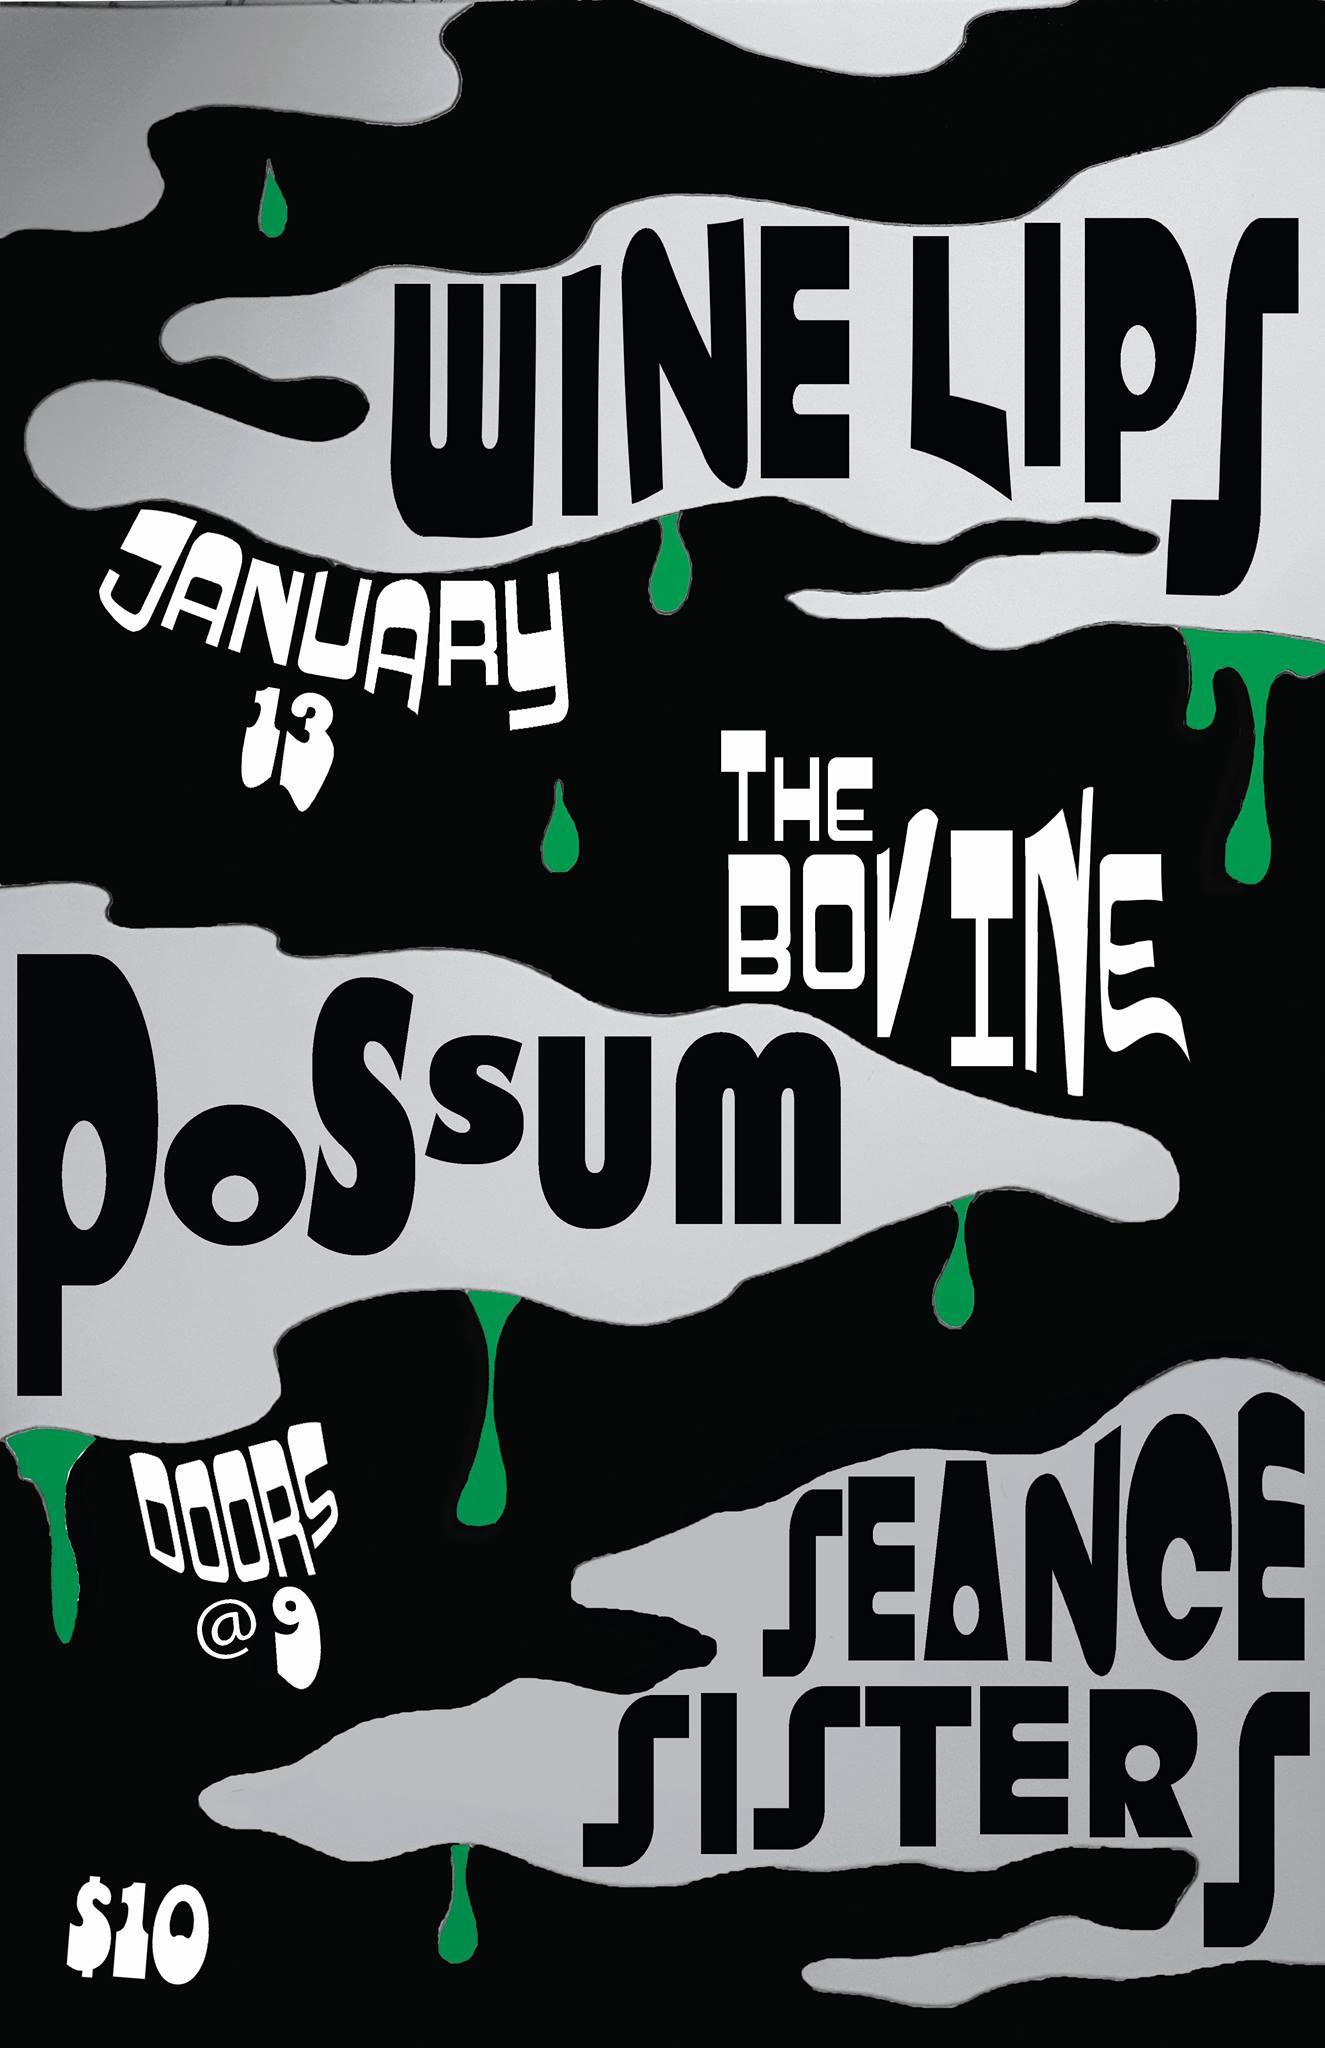 Cam's Birthday Extravaganza w/ Wine Lips Possum & Seance Sis